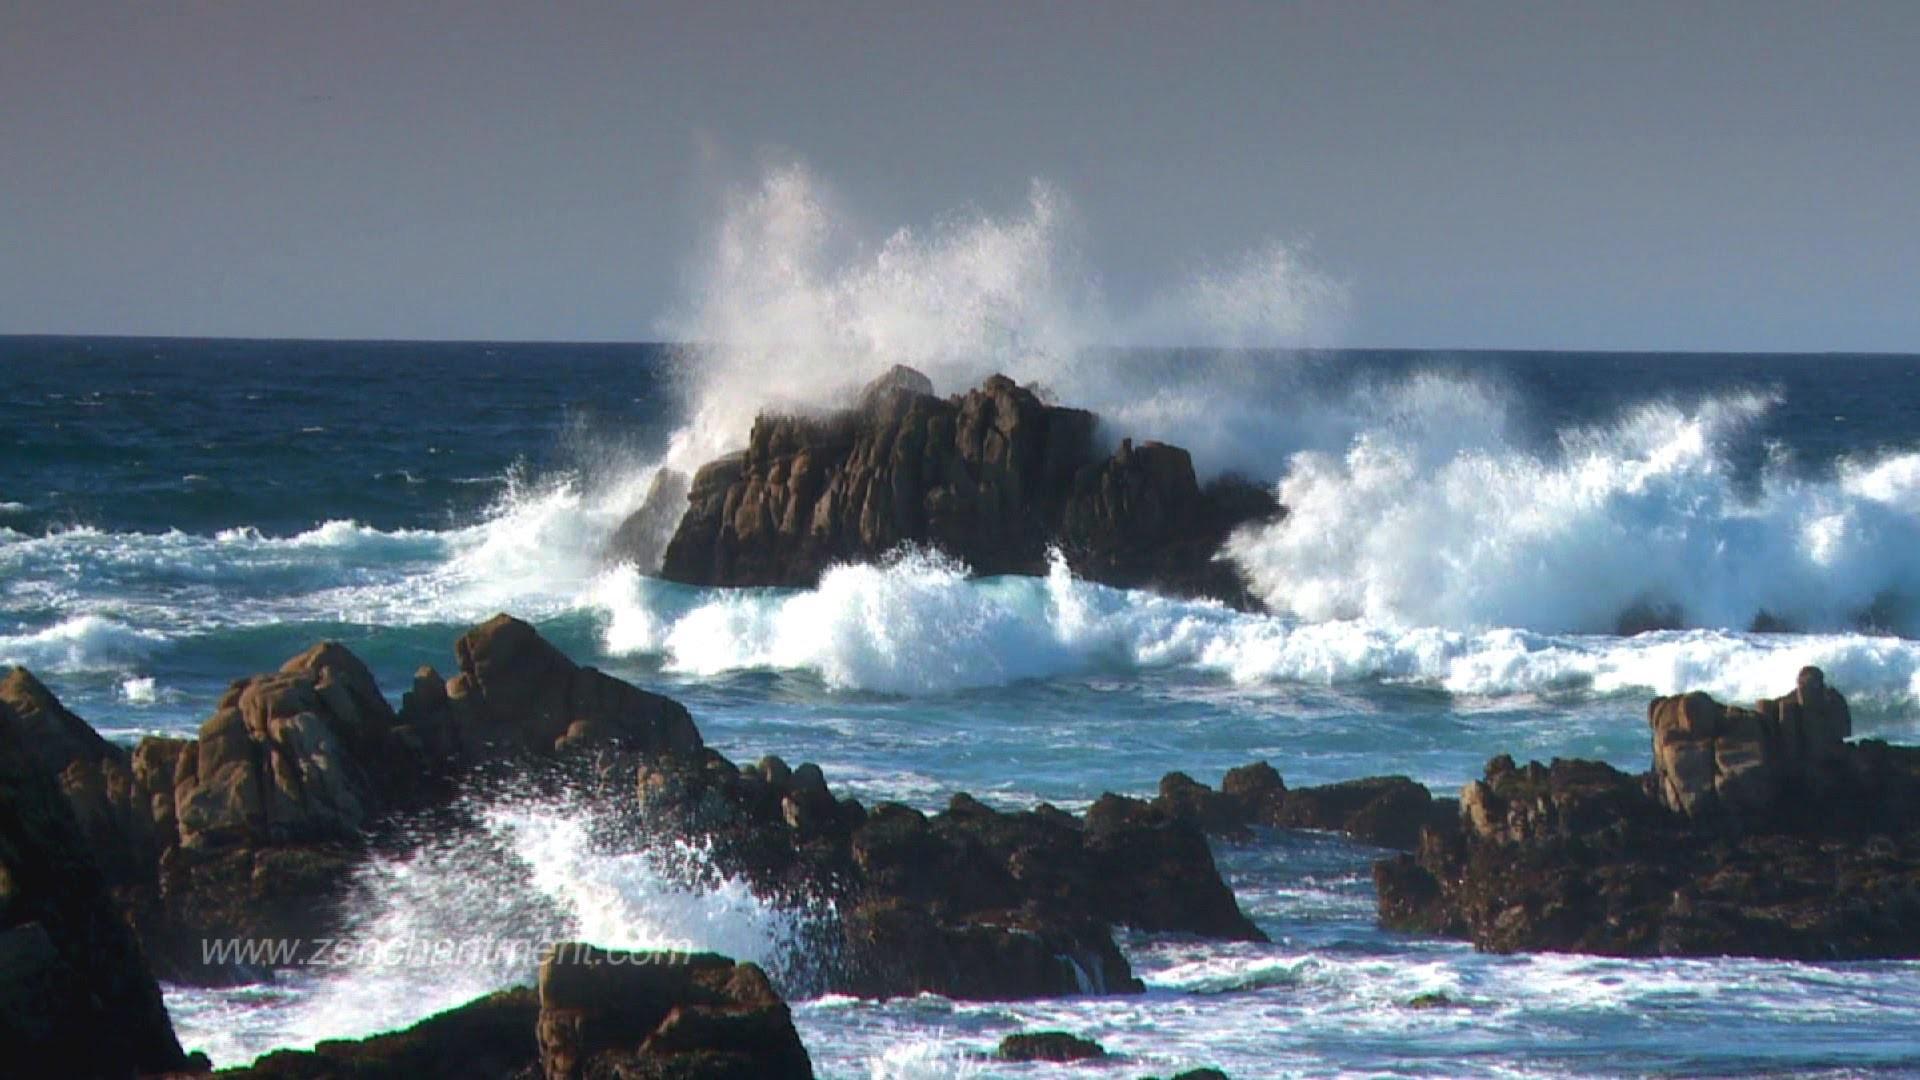 Zen Ocean Waves – Ocean Sounds Only (NO MUSIC) Aquatic Dream Therapy –  YouTube